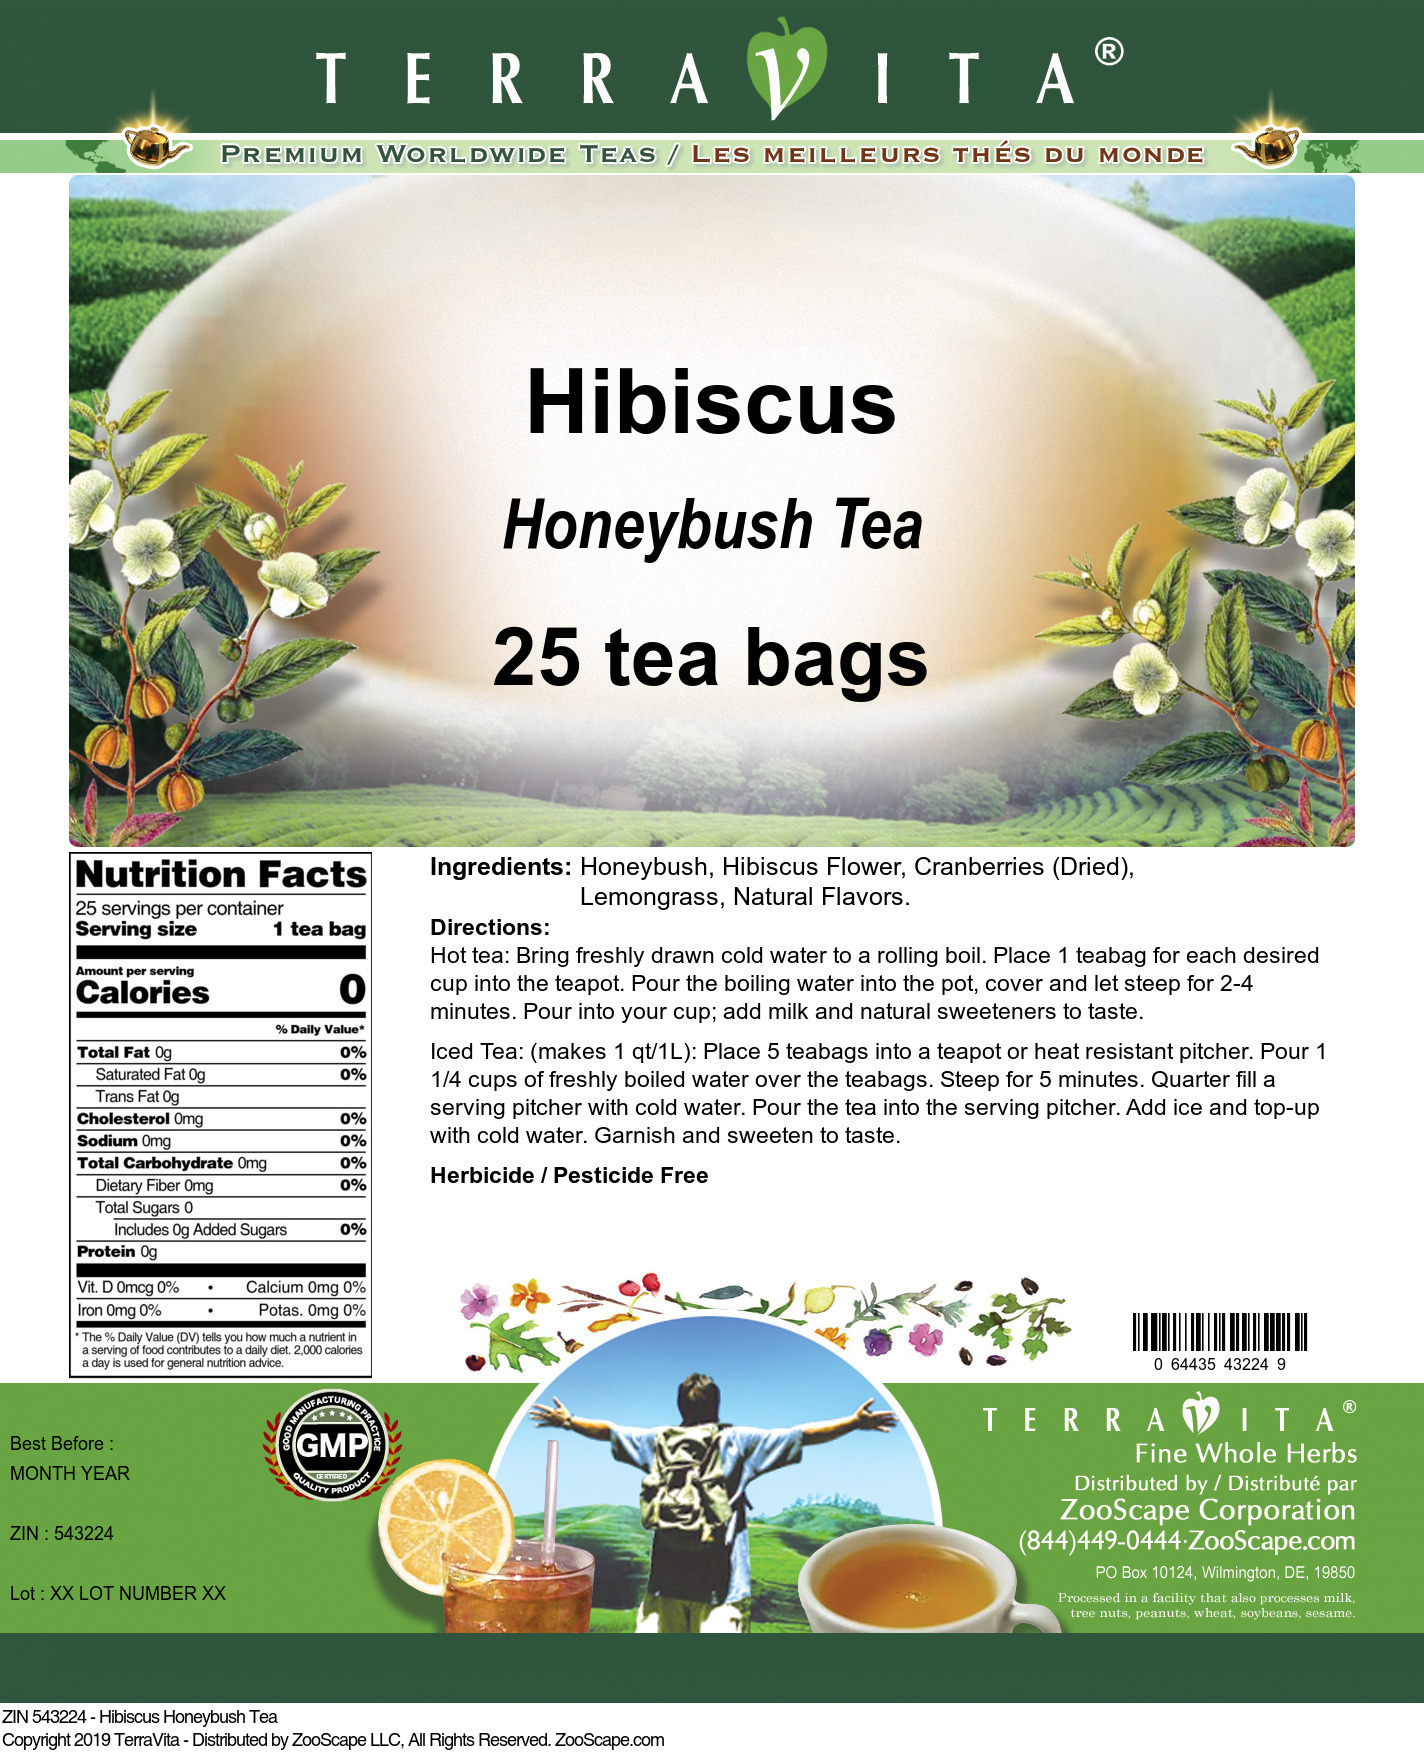 Hibiscus Honeybush Tea